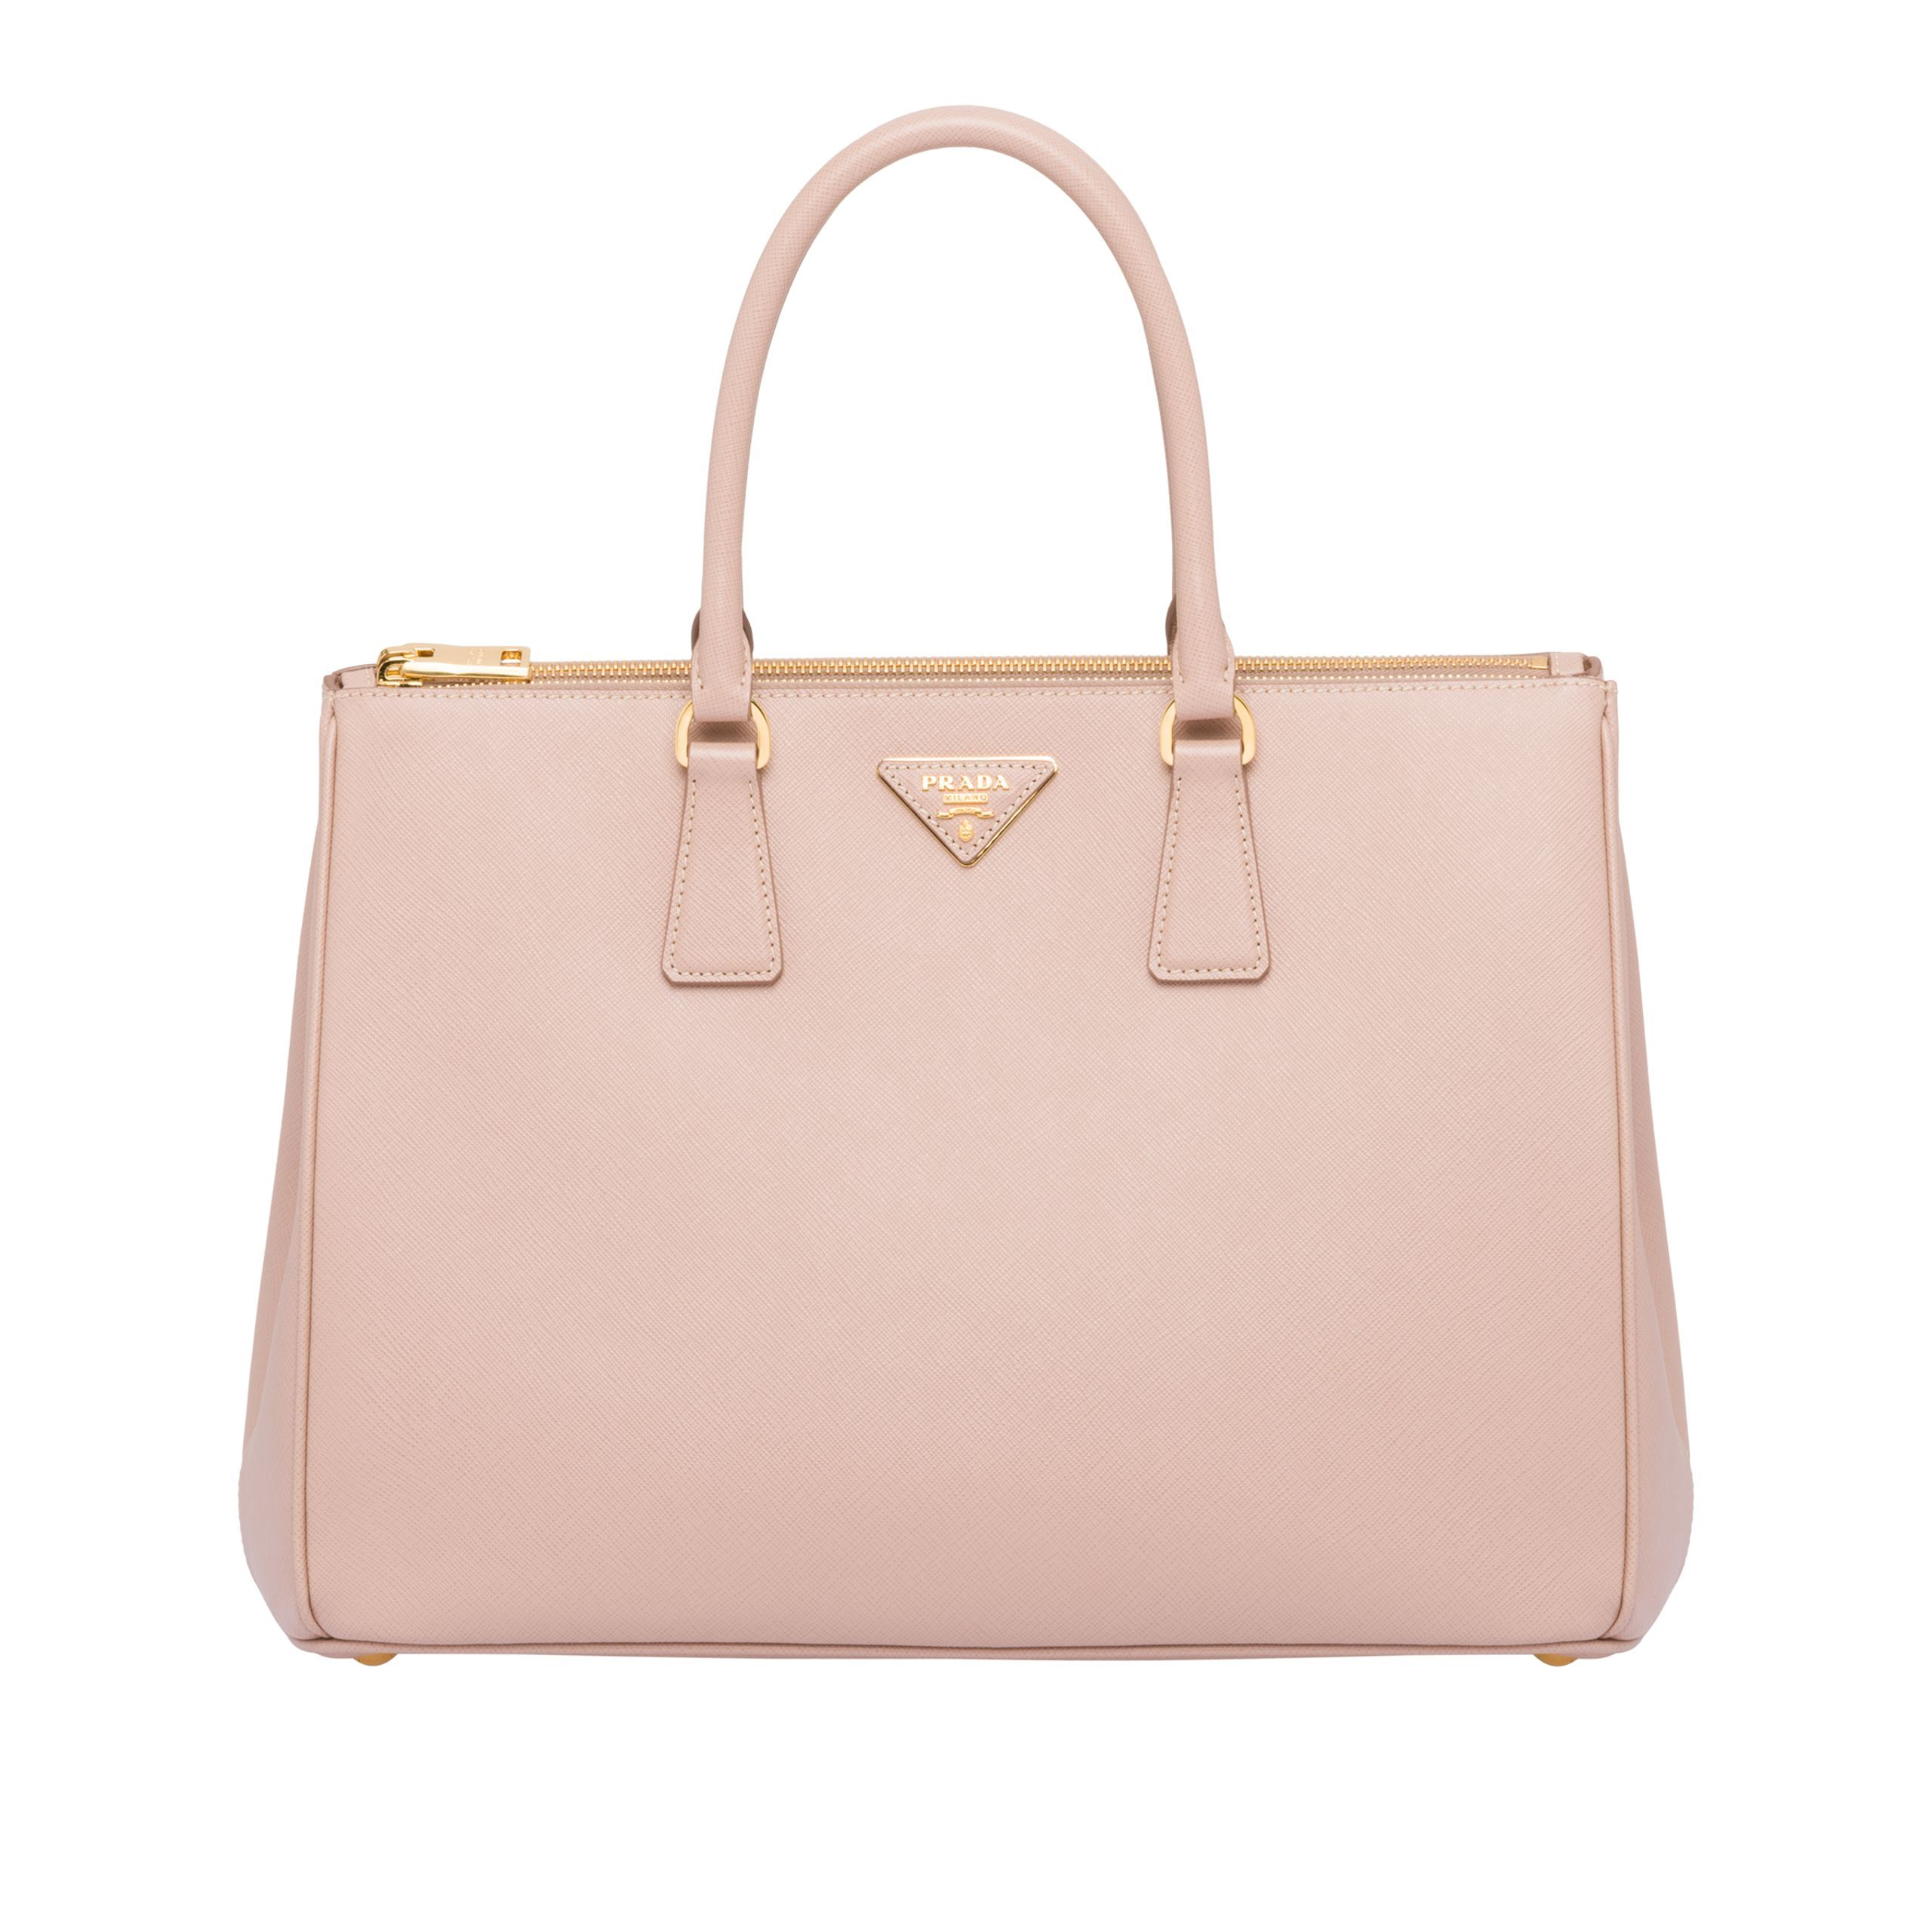 340e3322c618 Prada Galleria Large Saffiano Leather Bag